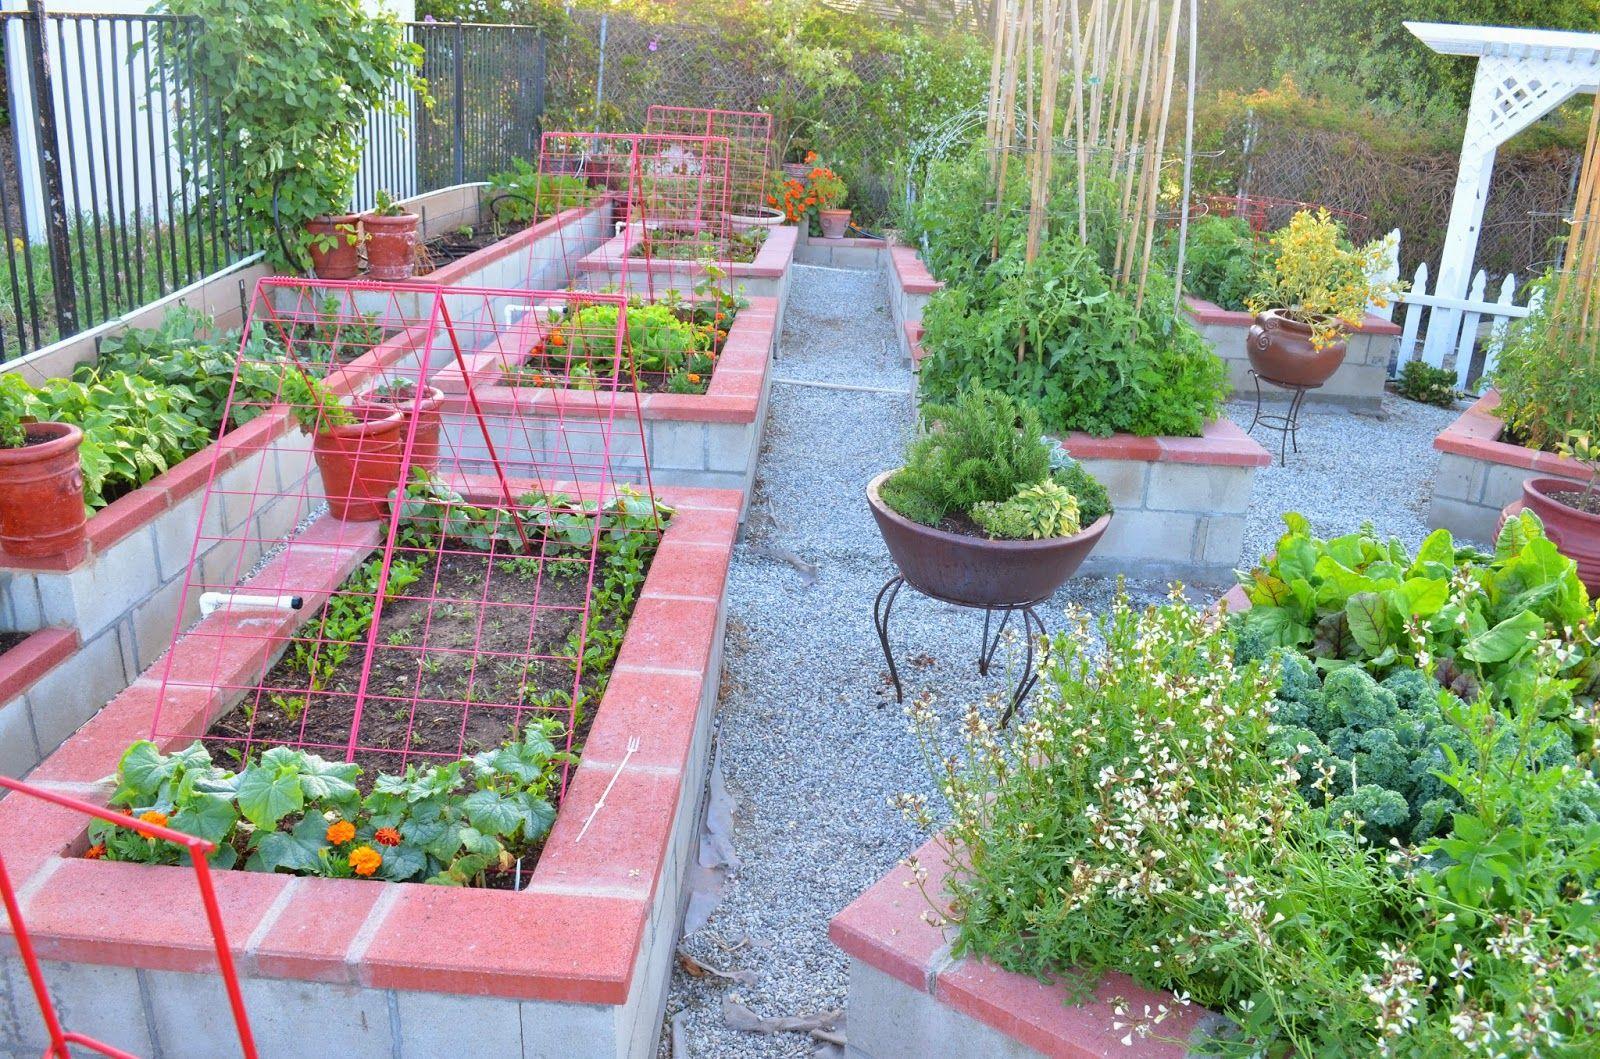 Kitchen garden. Cheap landscaping ideas, Vegetable